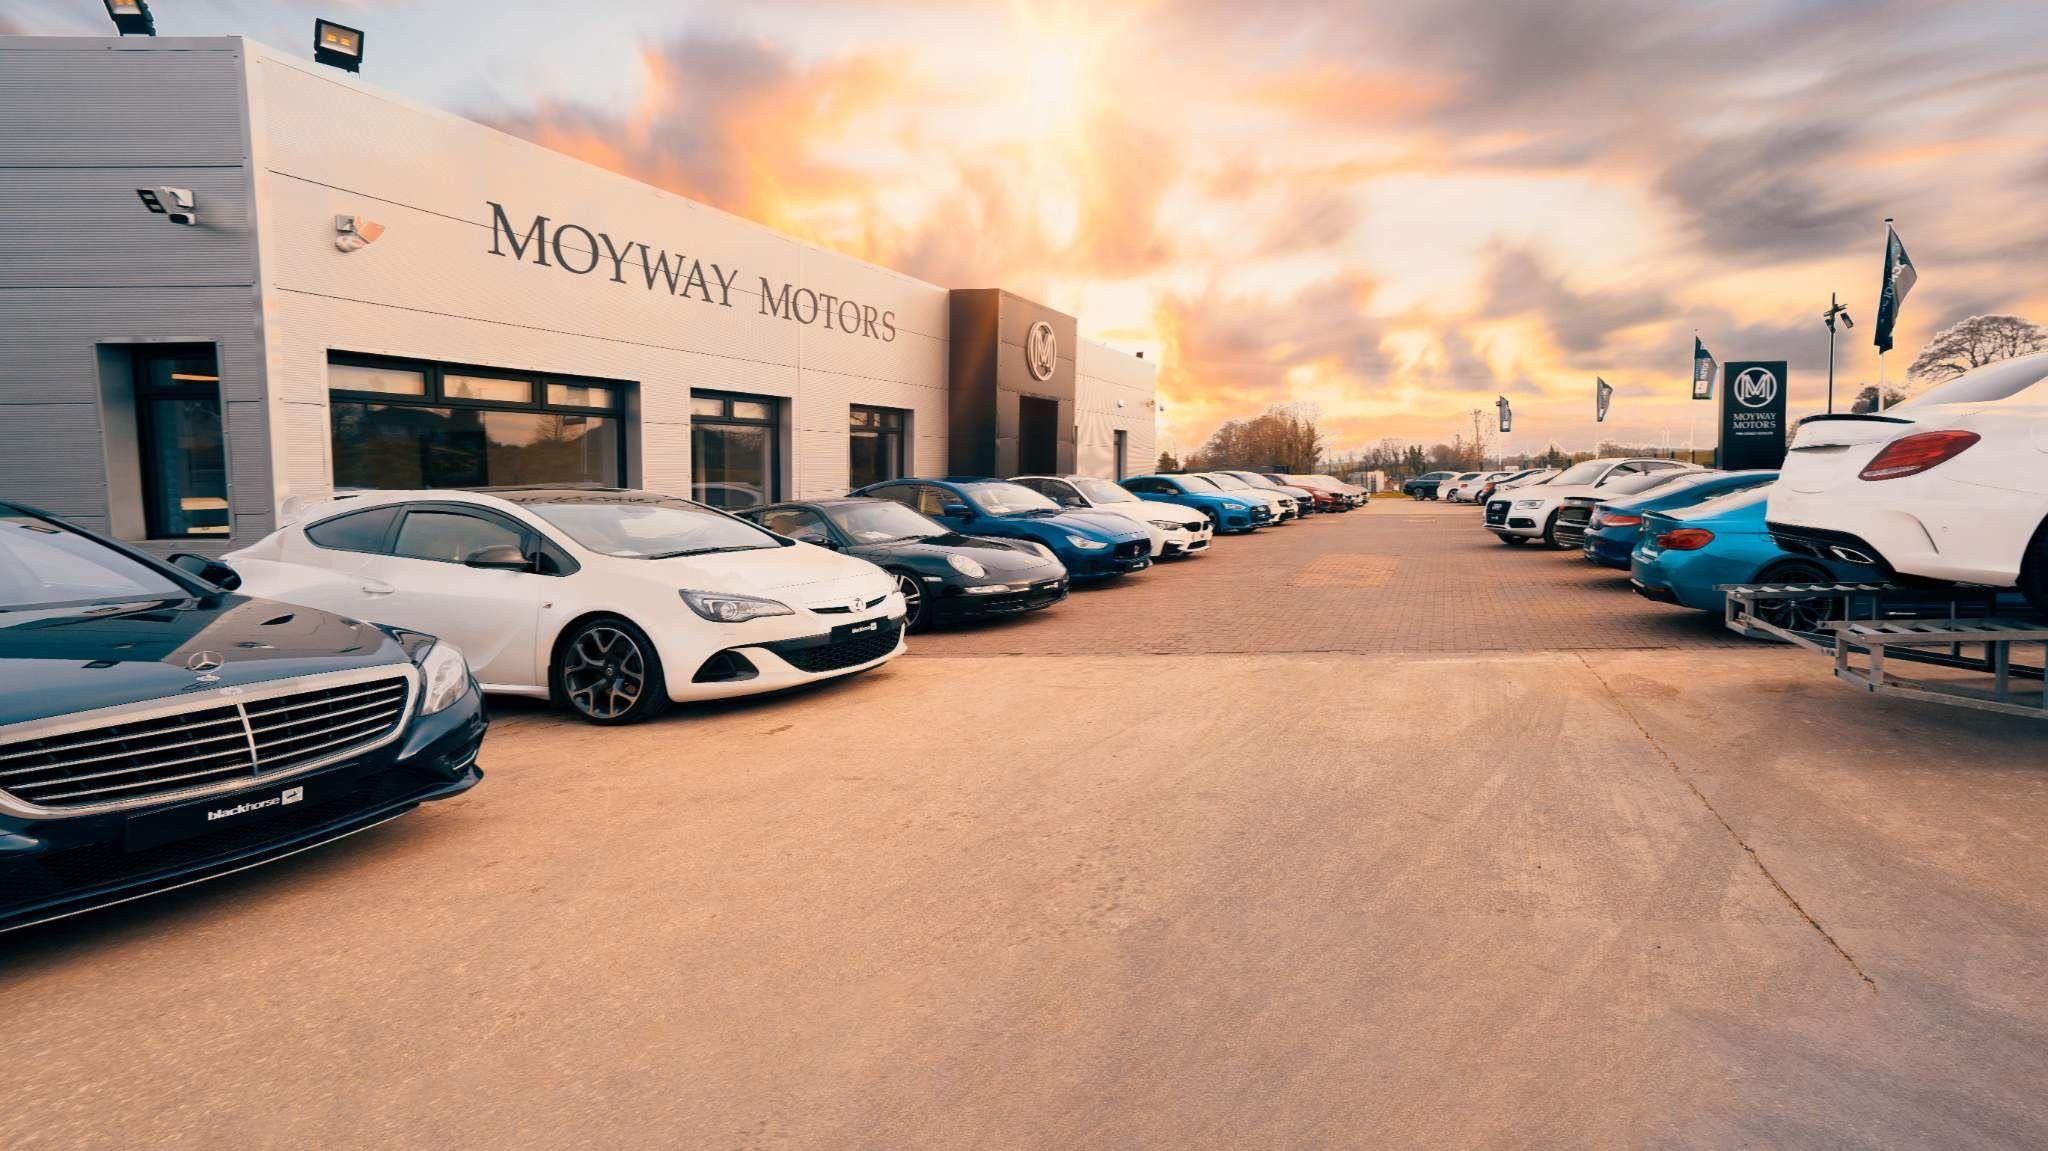 2017 BMW X4 2.0 20d M Sport Auto xDrive (s/s) 5dr Diesel Automatic – Moyway Motors Dungannon full